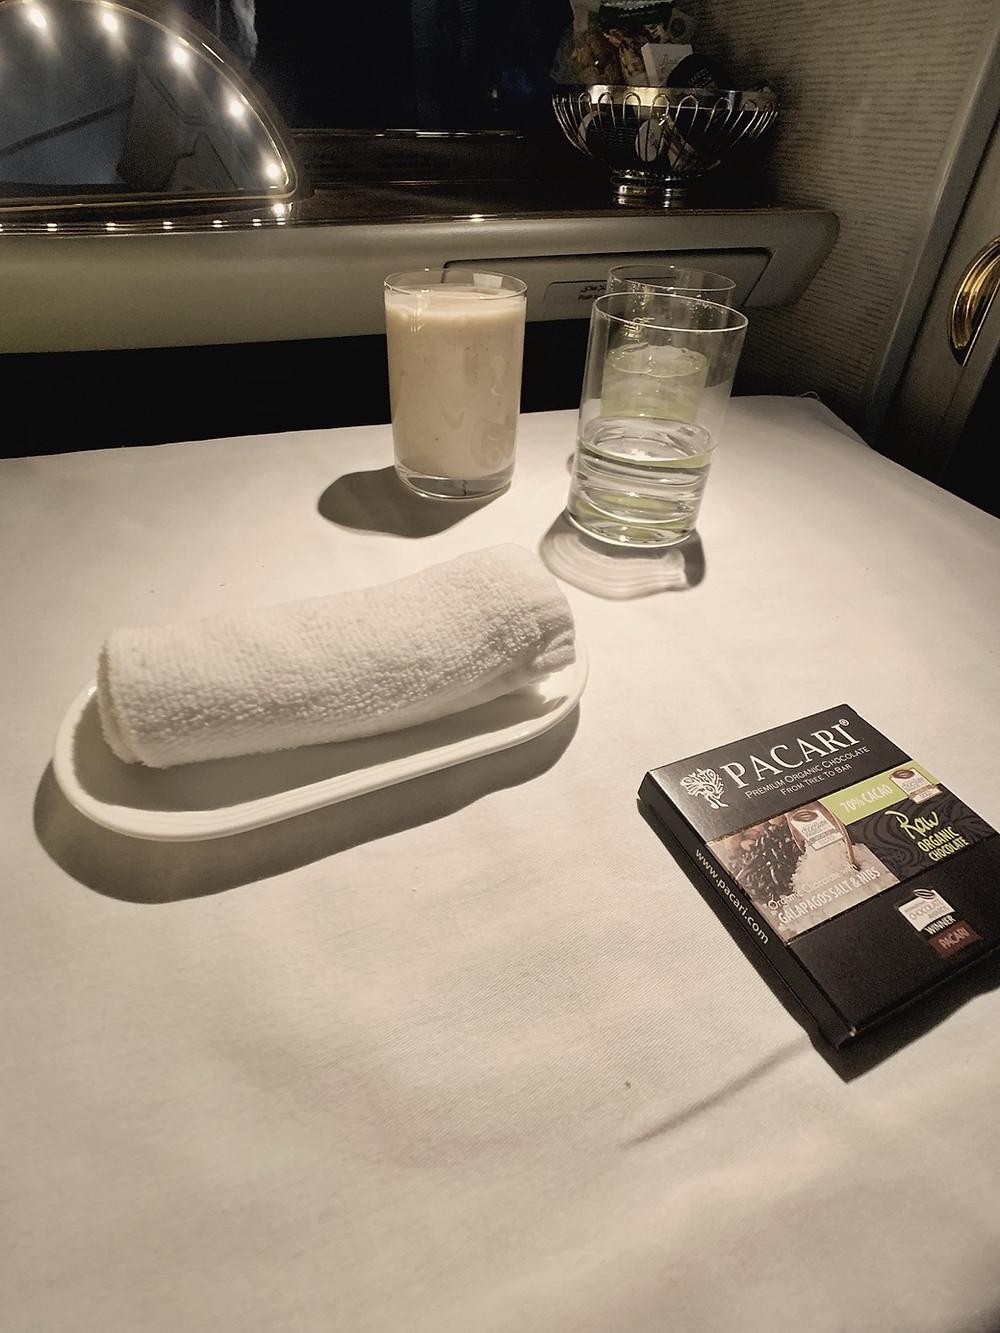 Emirates First Class San Francisco - Dubai, Breakfast Service